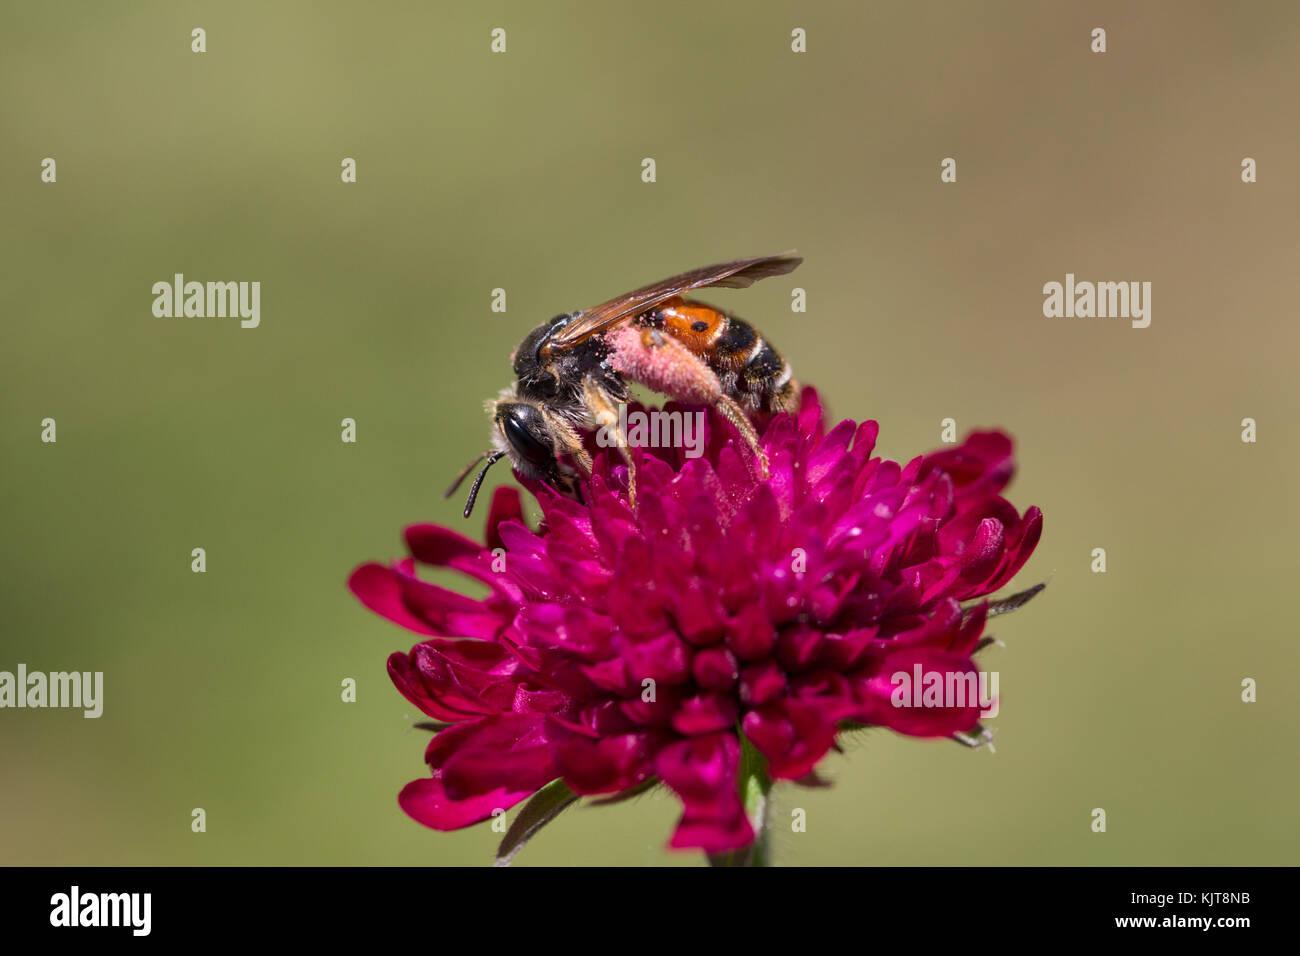 A mining bee (Andrena hattorfiana) on  field scabious (Knautia arvensis) - Stock Image